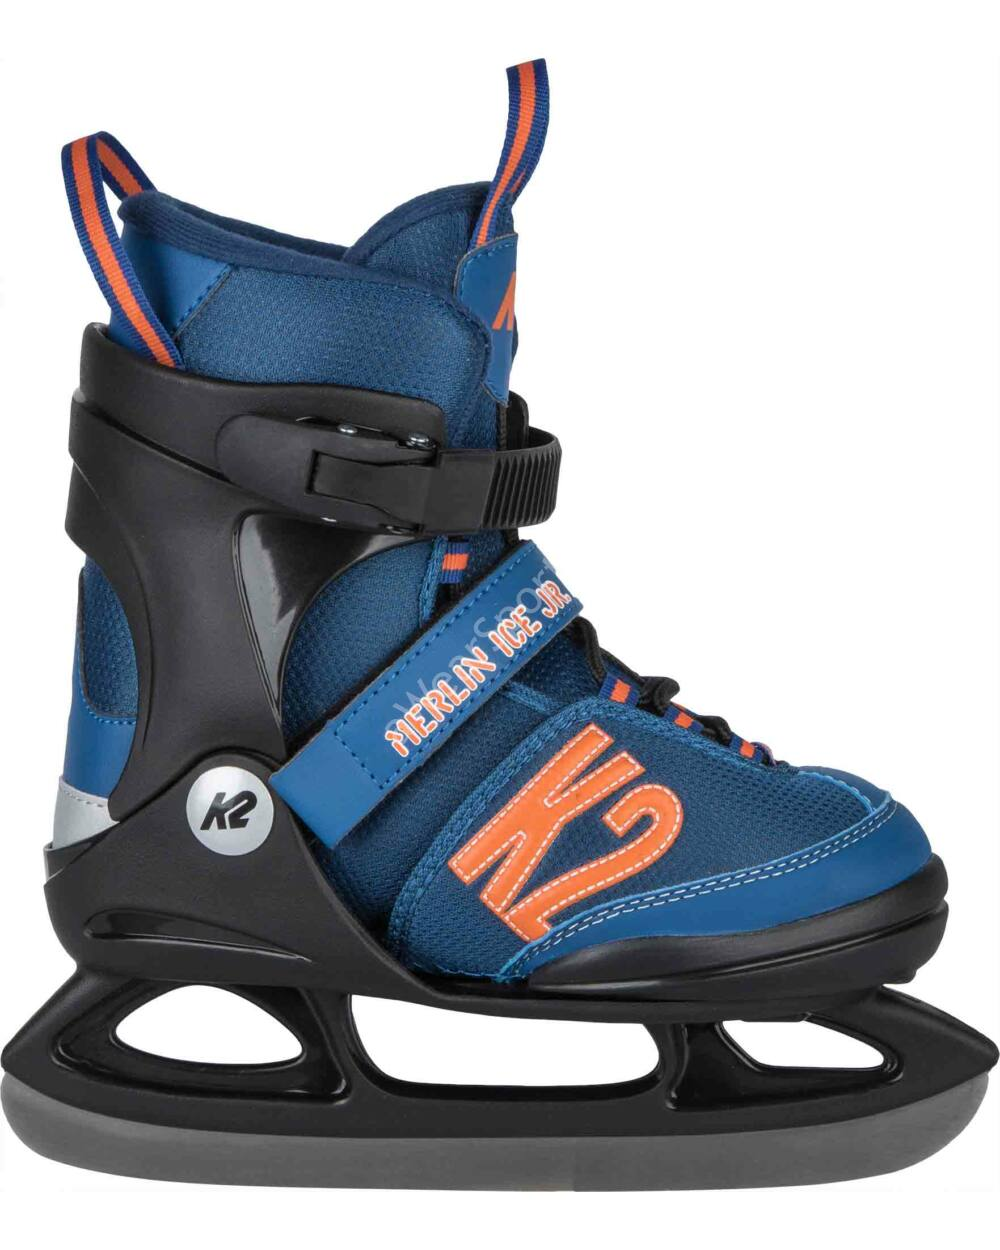 K2 Merlin Ice gyermek jégkorcsolya, 32-37